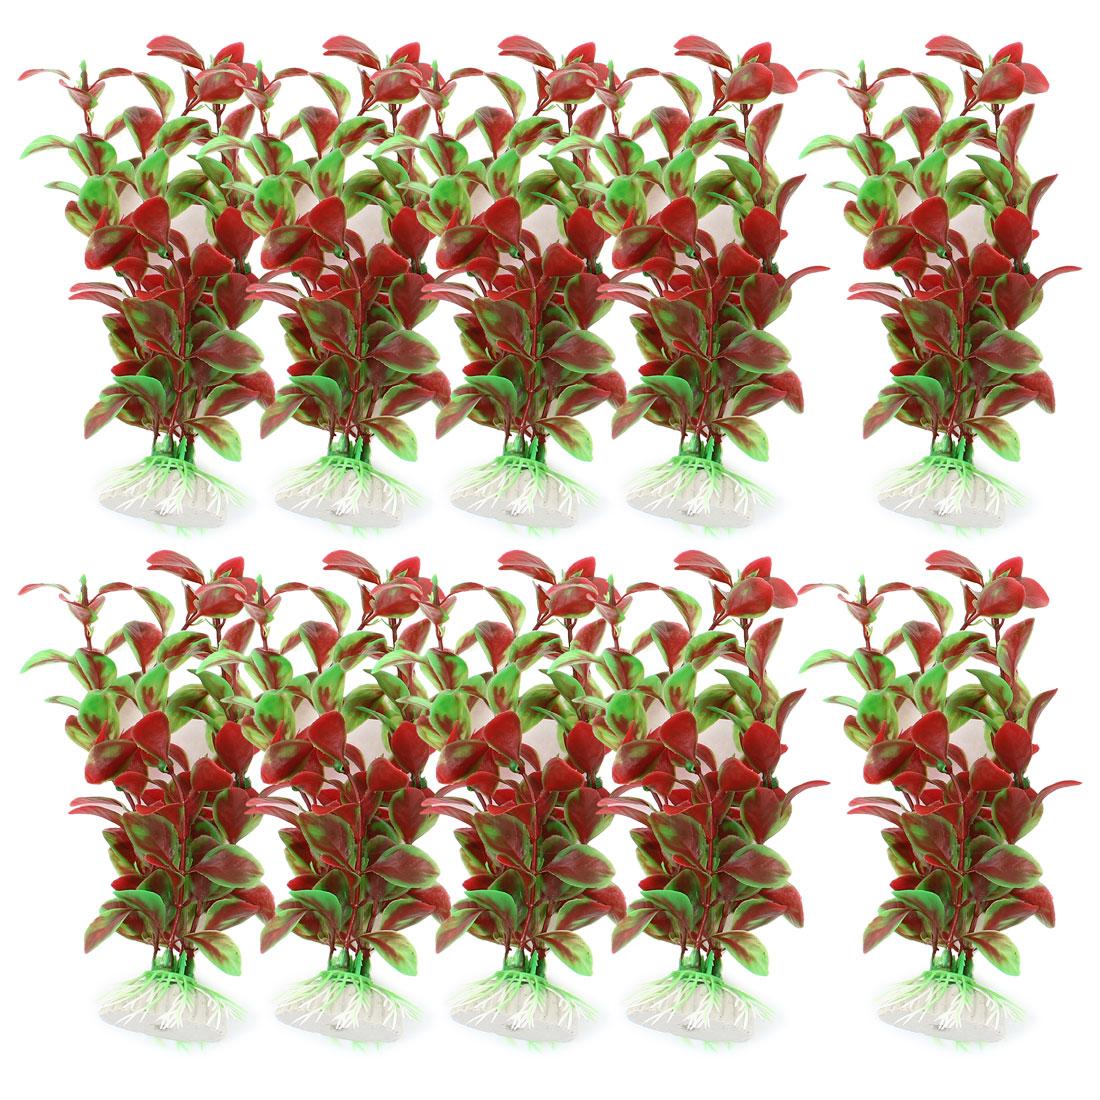 "10 Pcs 6.7"" High Red Green Underwater Plastic Plant Grass for Fish Tank Aquarium"